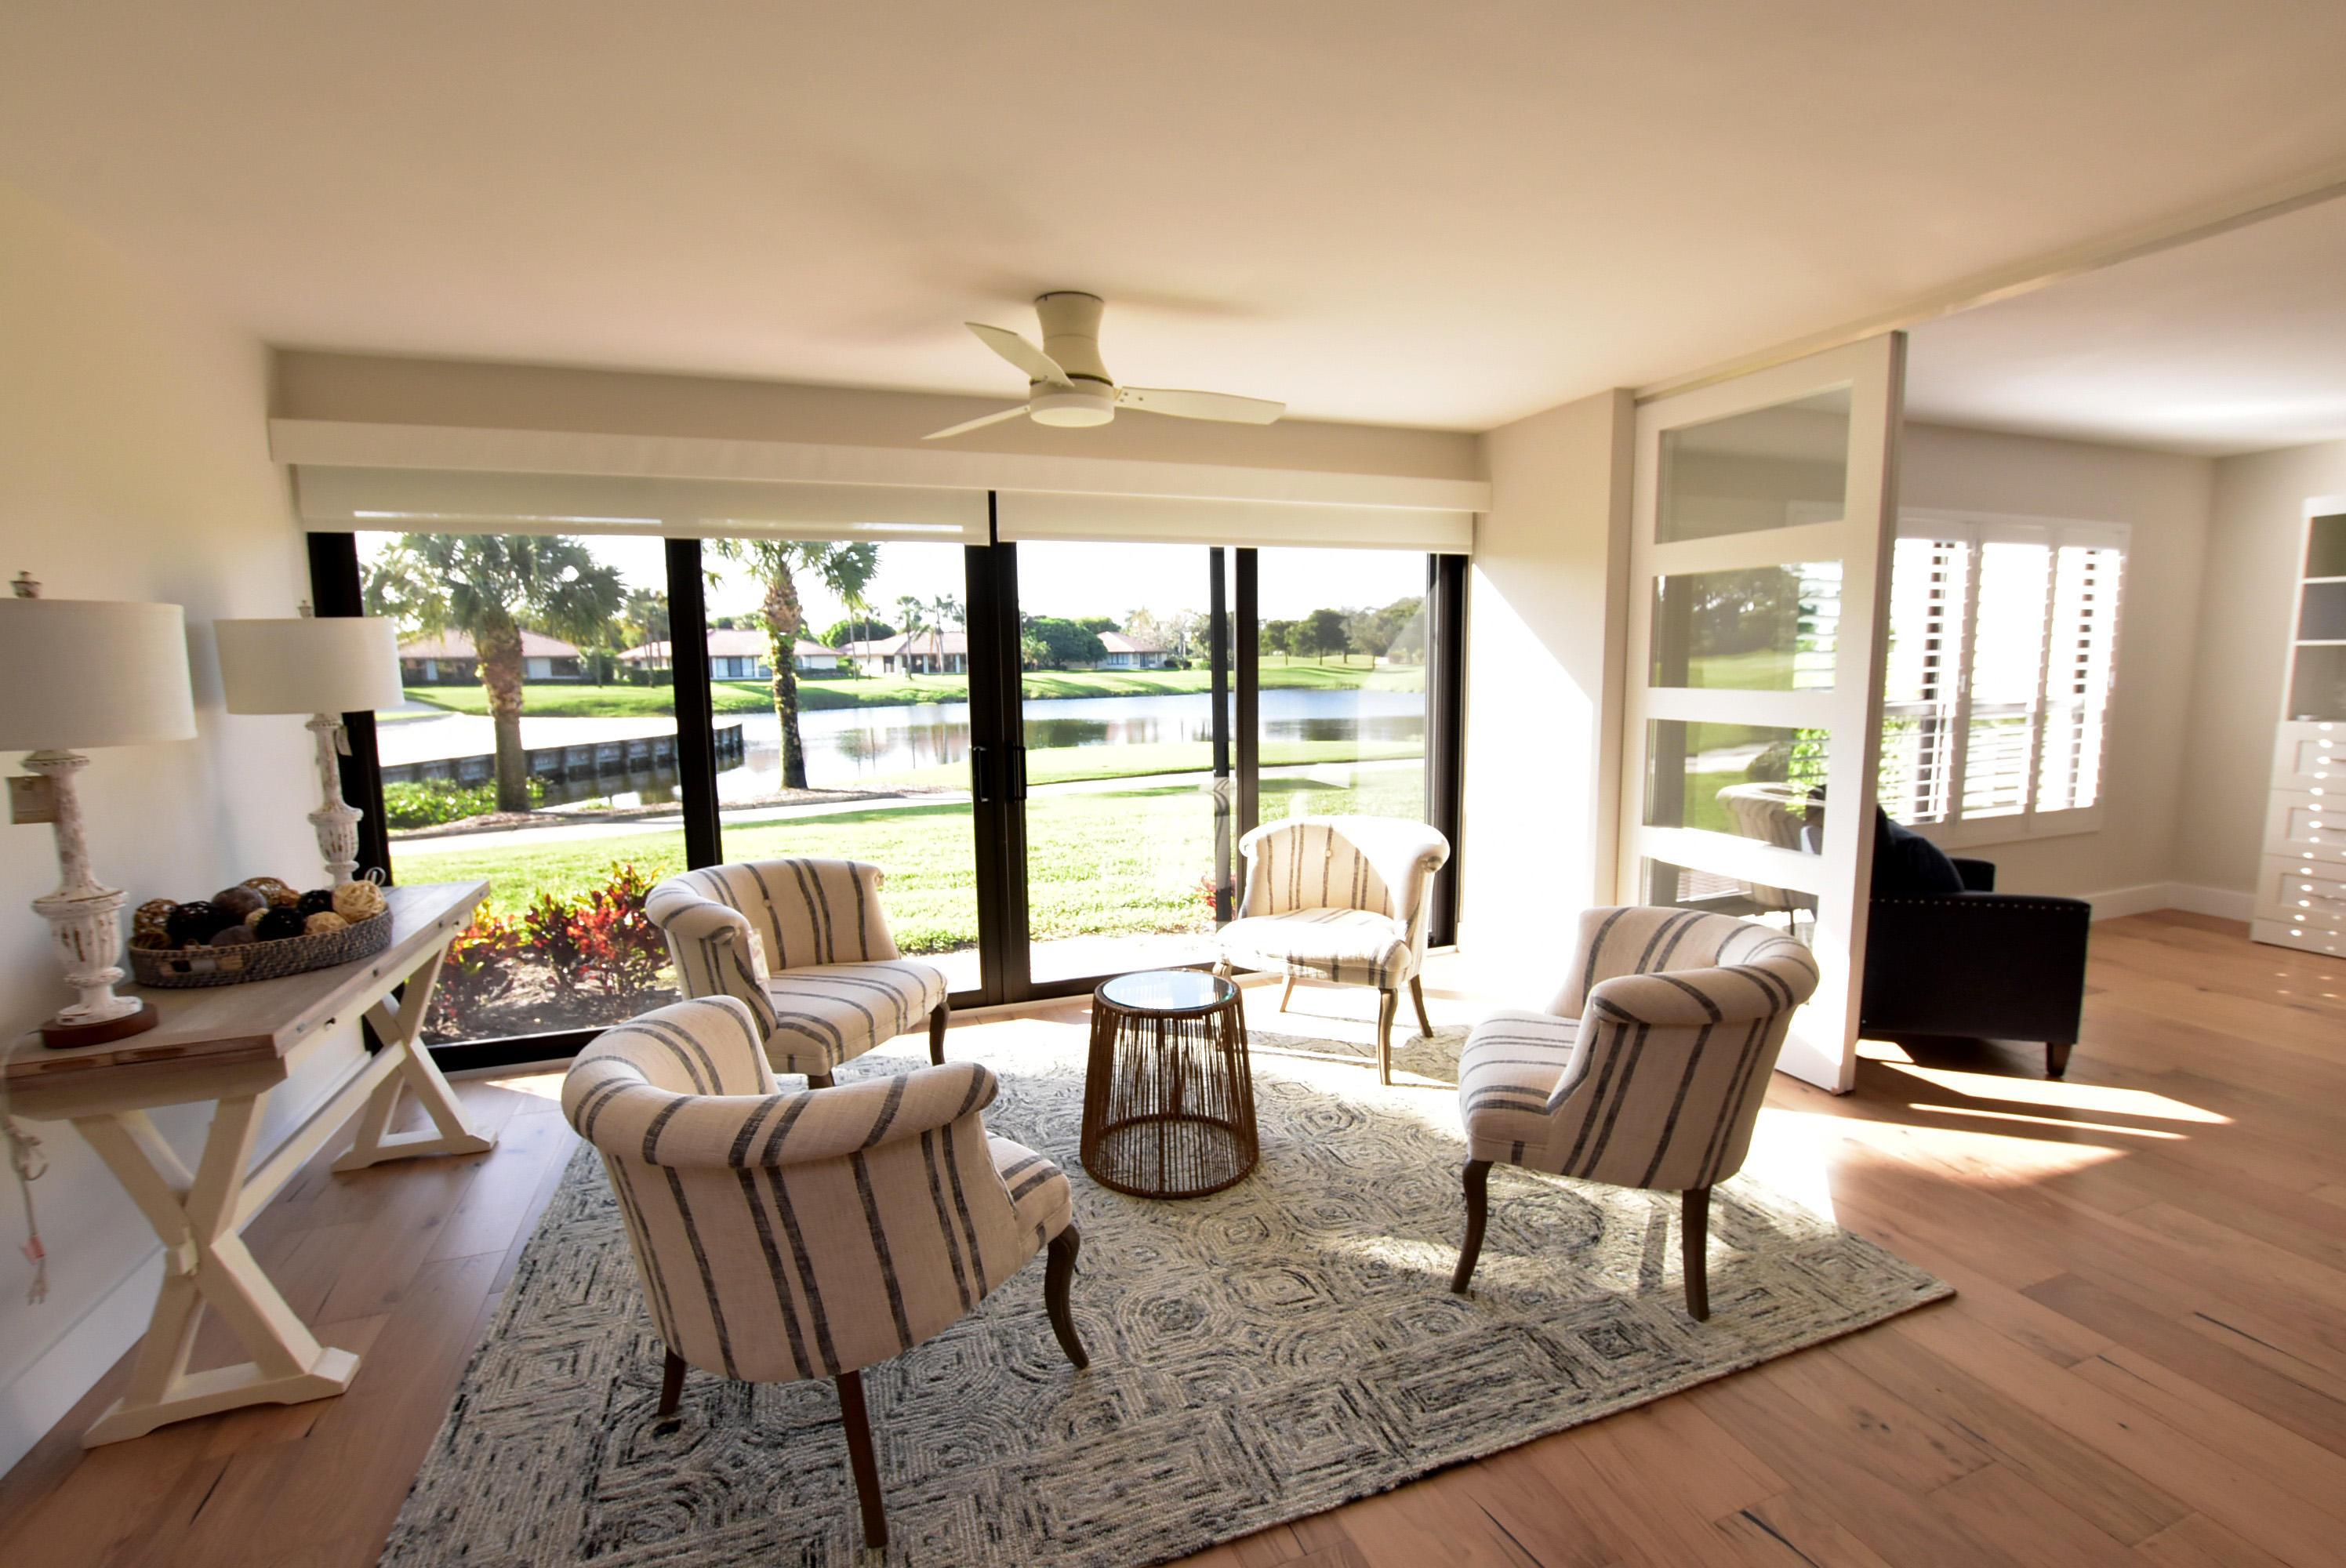 10267 Quail Covey Road Hibiscus S, Boynton Beach, Florida 33436, 3 Bedrooms Bedrooms, ,2 BathroomsBathrooms,A,Condominium,Quail Covey,RX-10594012